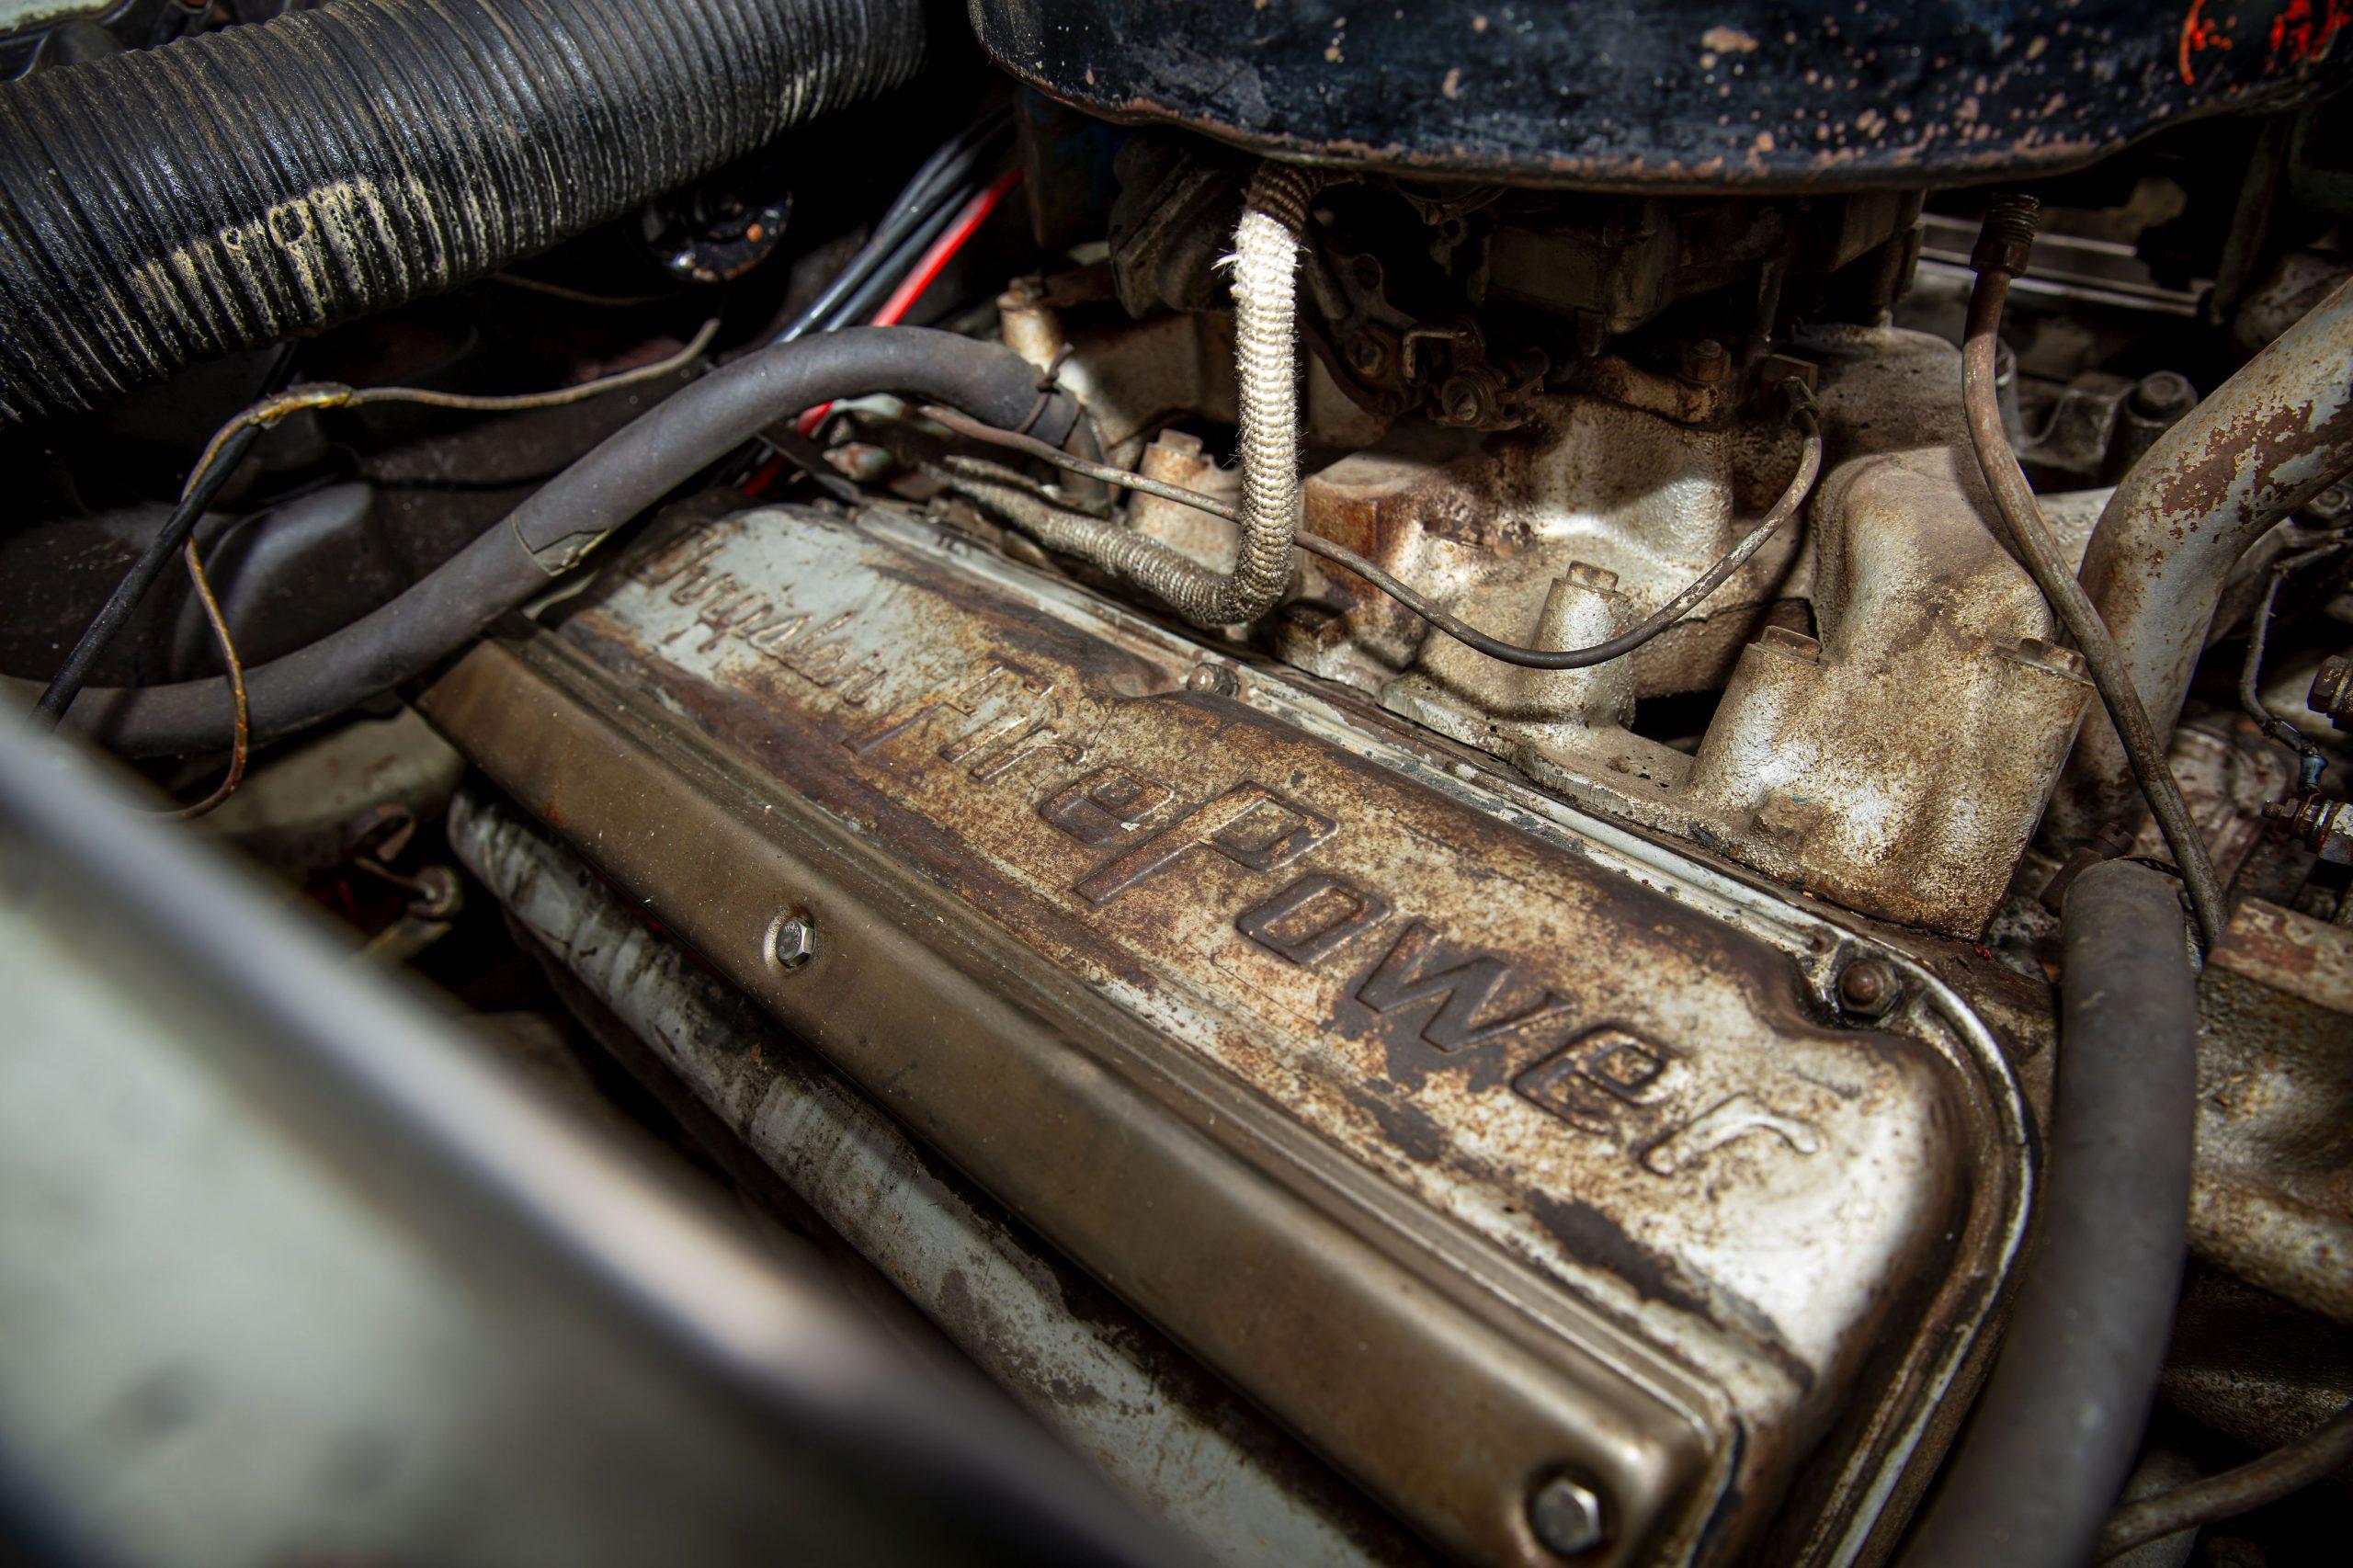 Chrysler ST Special coupe par Ghia engine